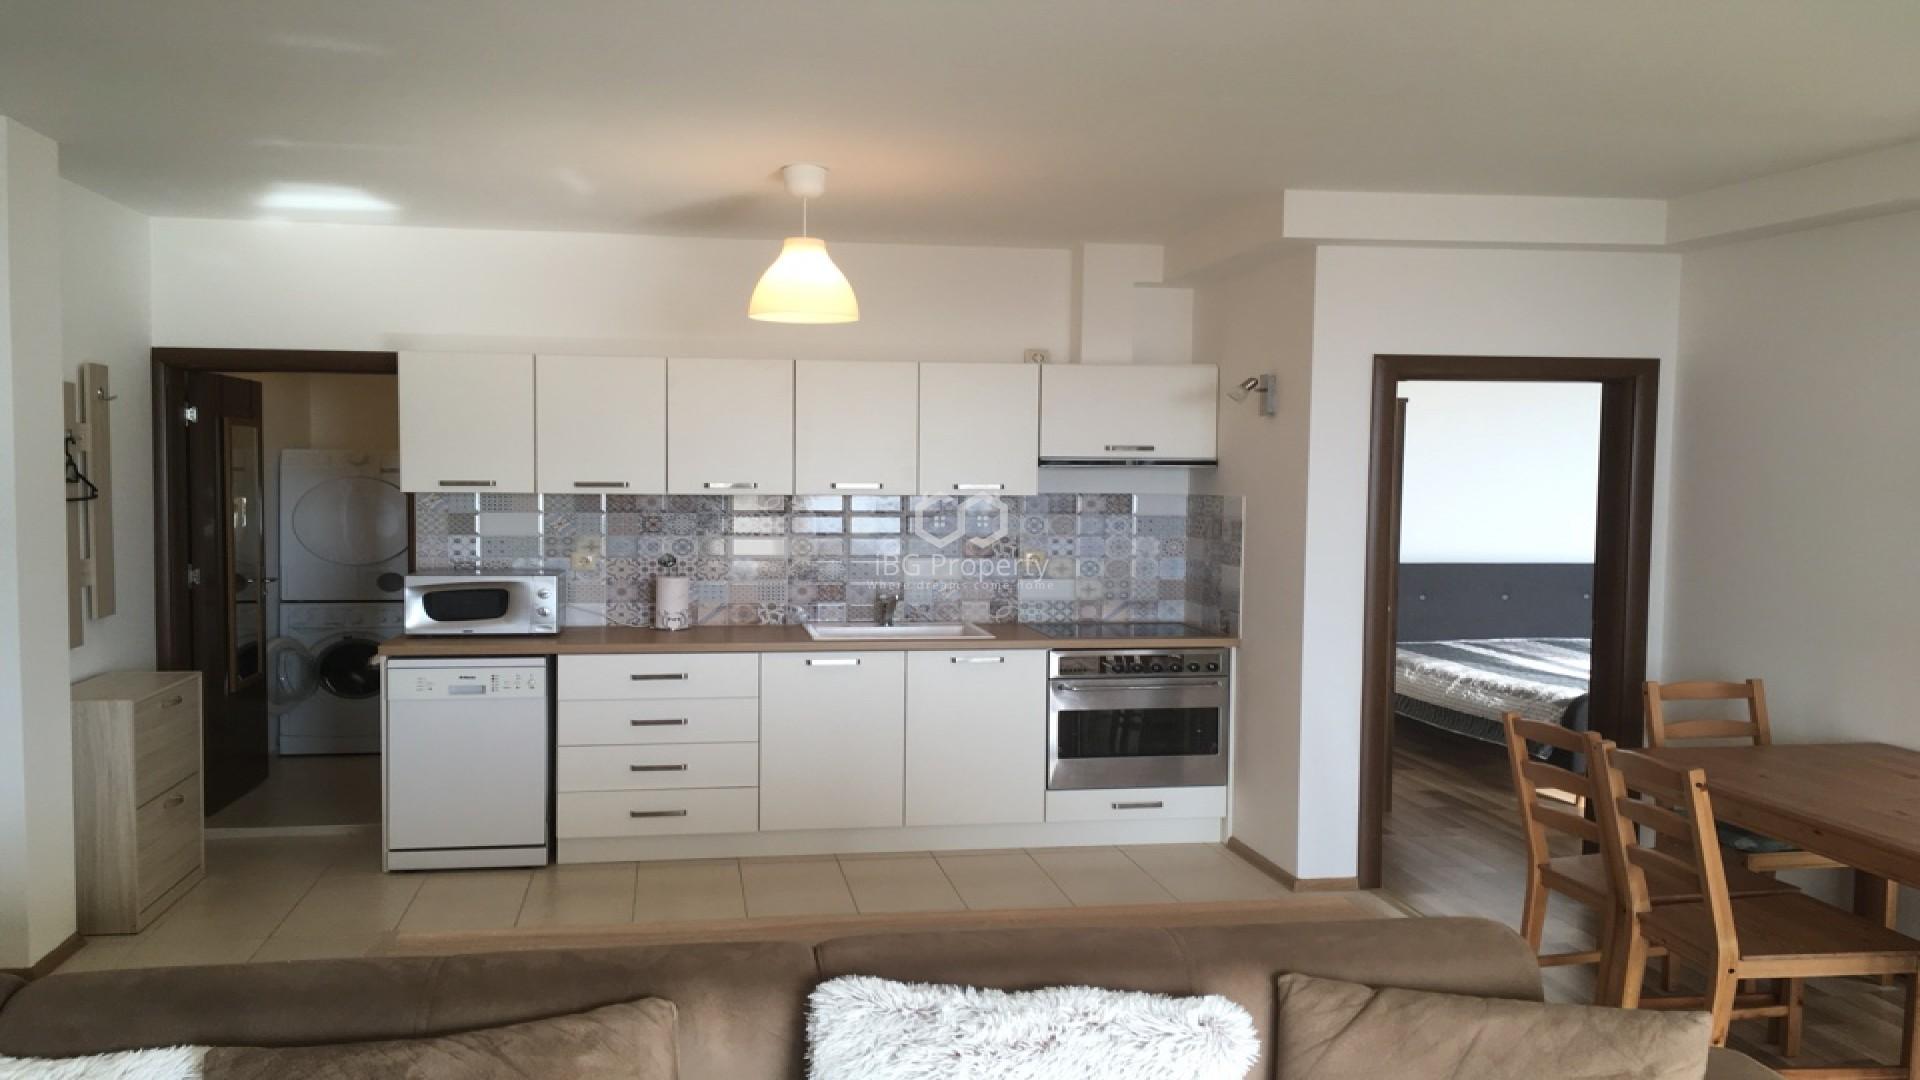 One bedroom apartment Briz Varna 72 m2